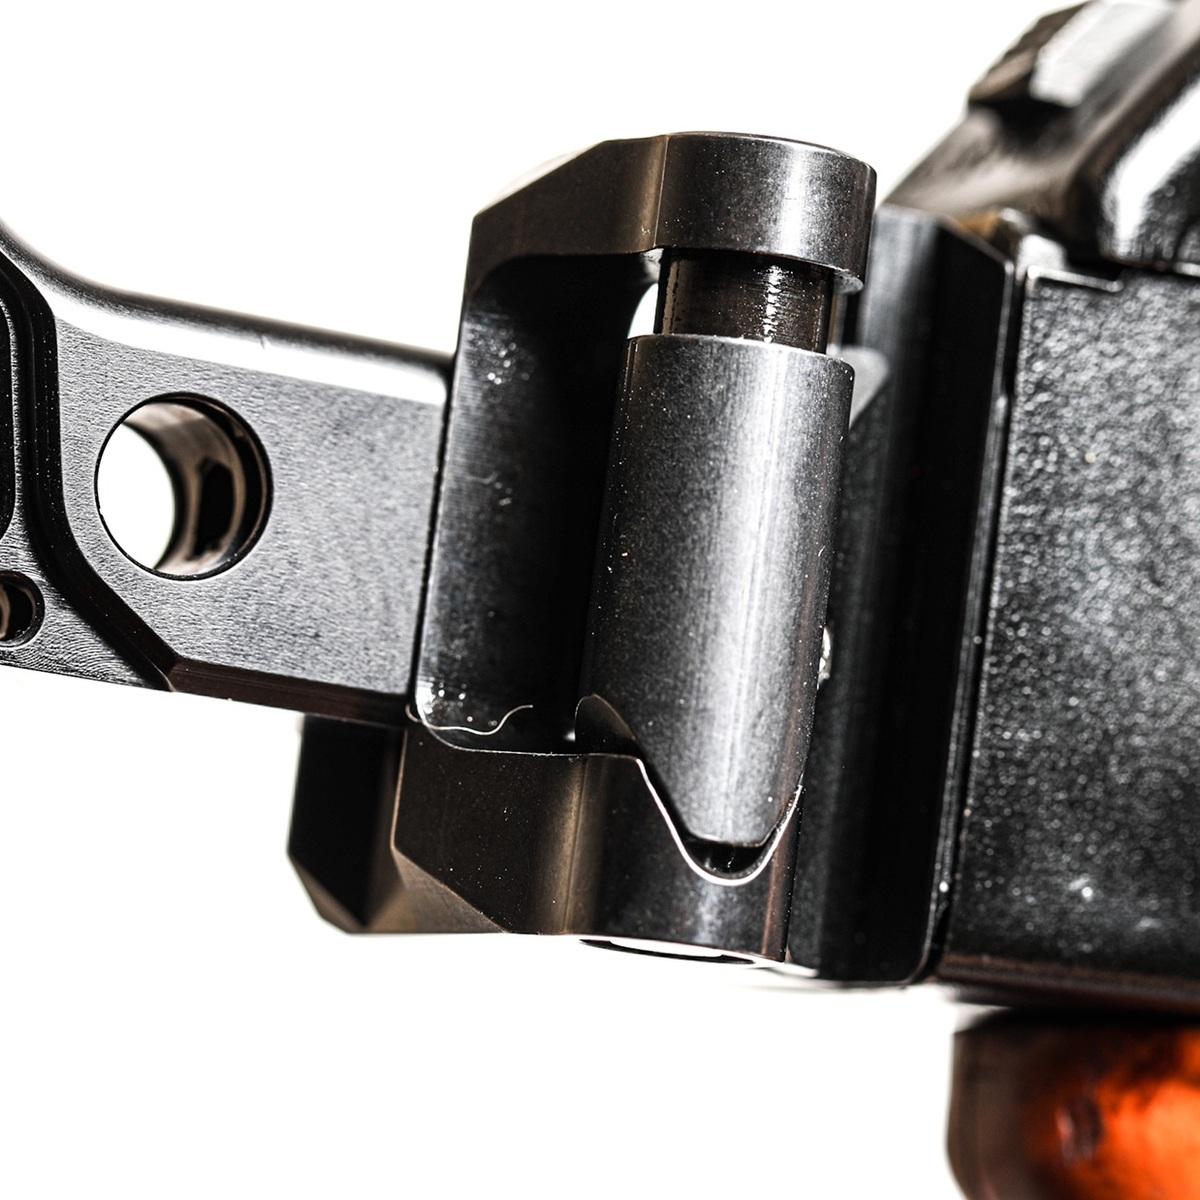 jmac customs llc 1913 folding mech picatinny stock adapter brace armbar stock